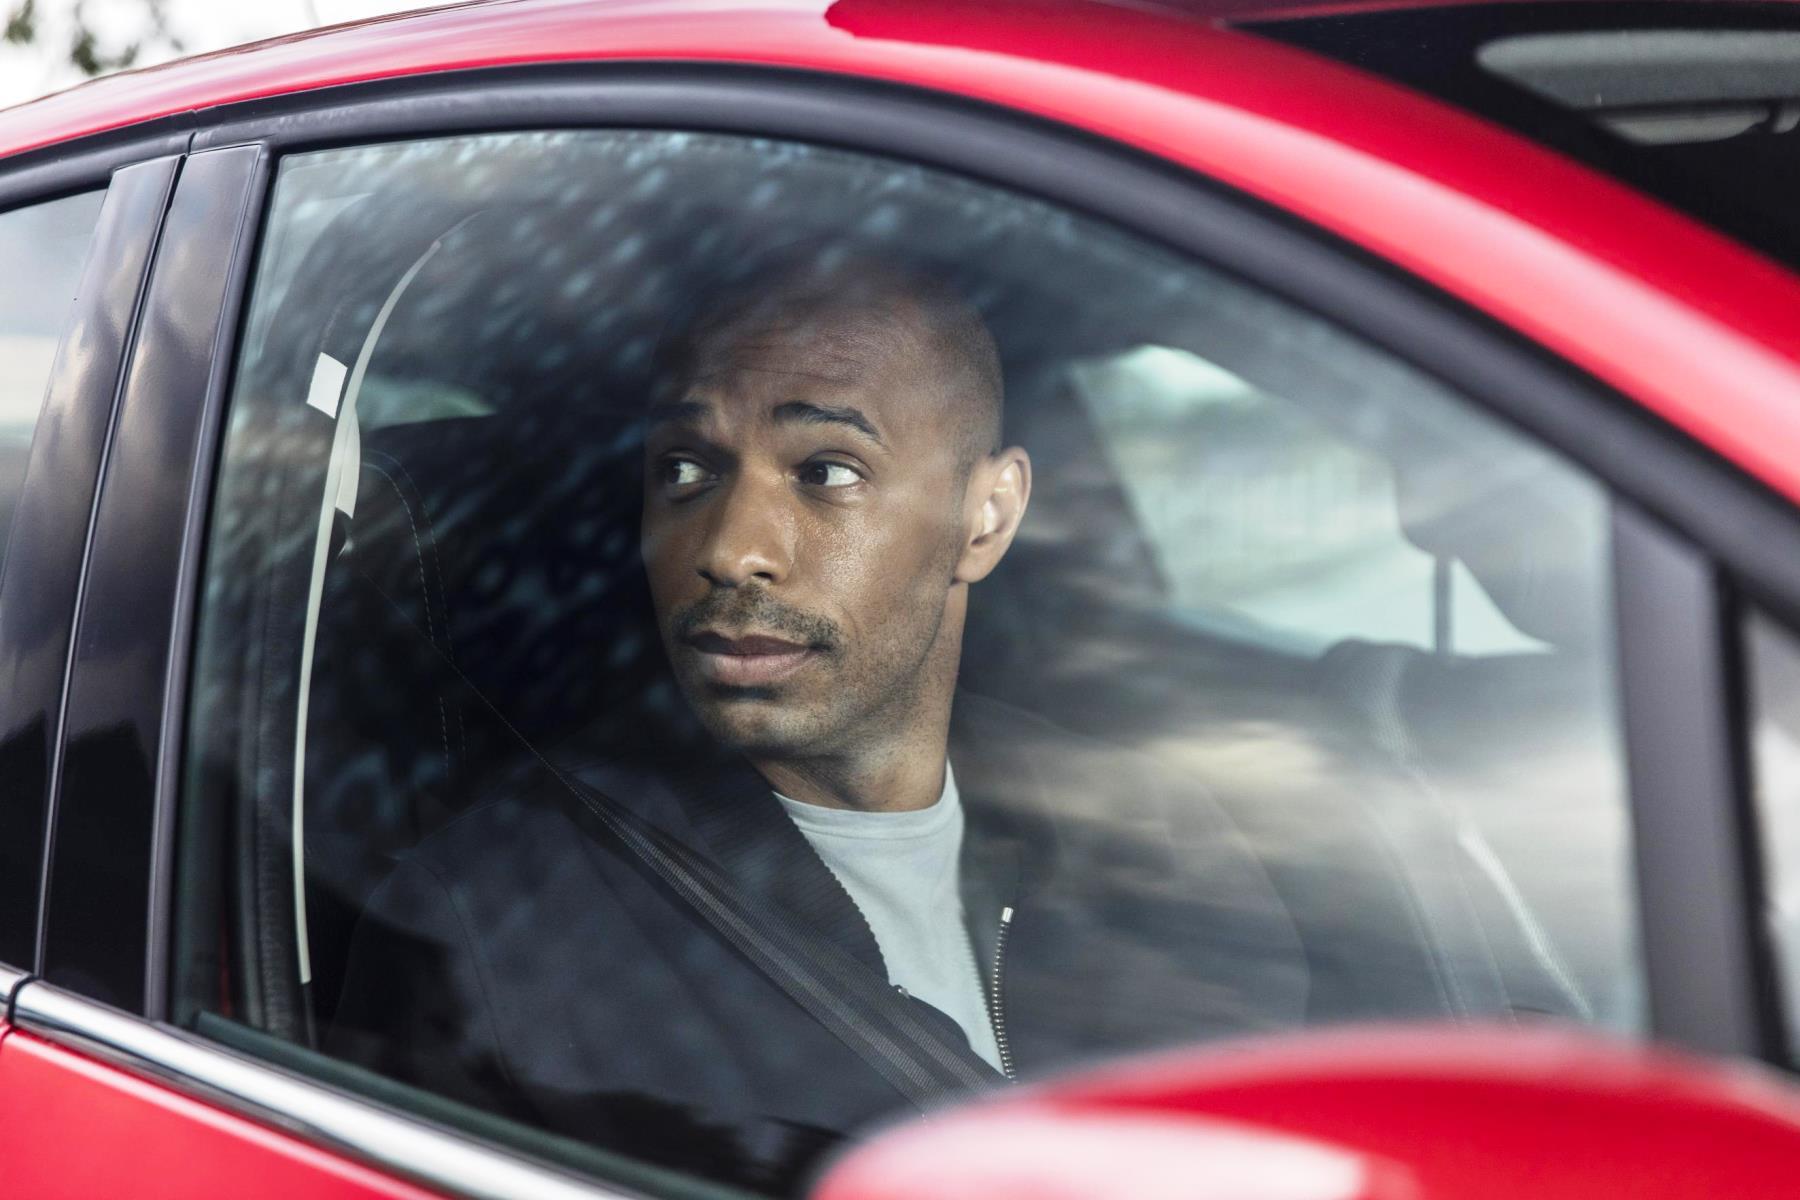 Va Va Voom is back - Thierry Henry returns to Renault (2)